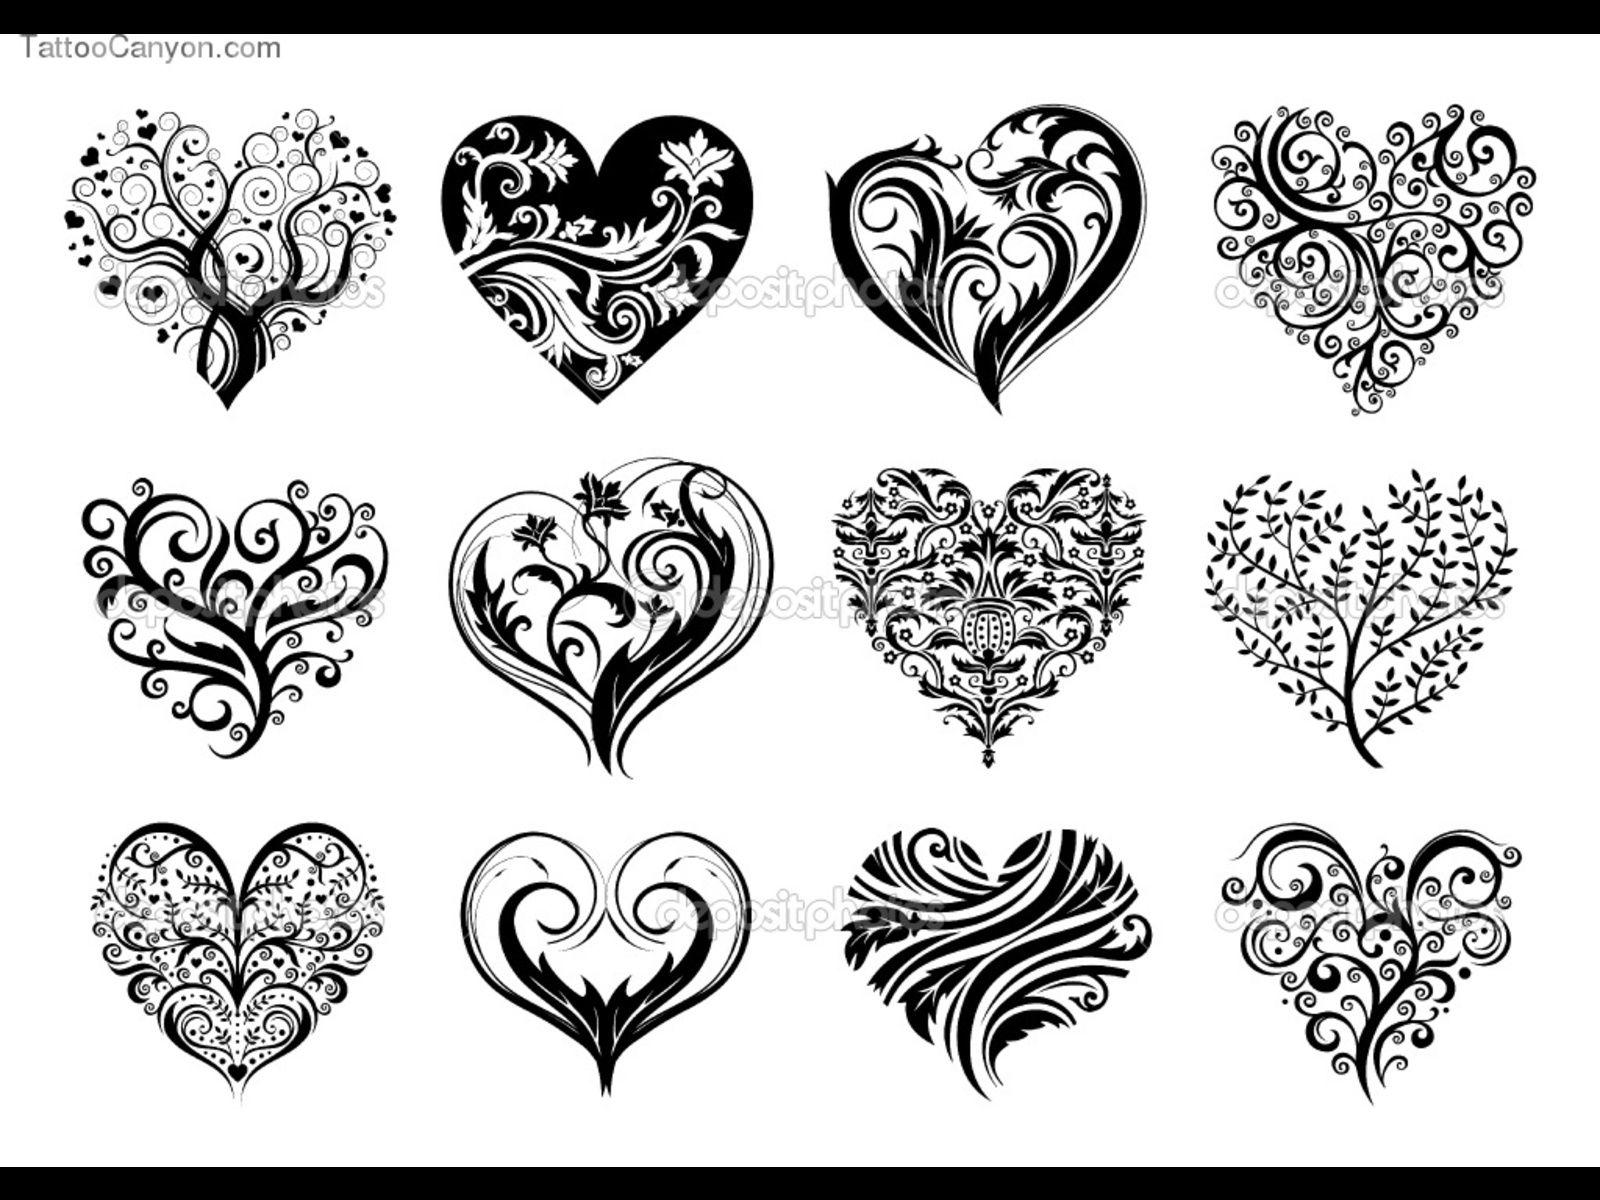 Tattoo designs for women small heart tattoos tattoo and angel buycottarizona Choice Image